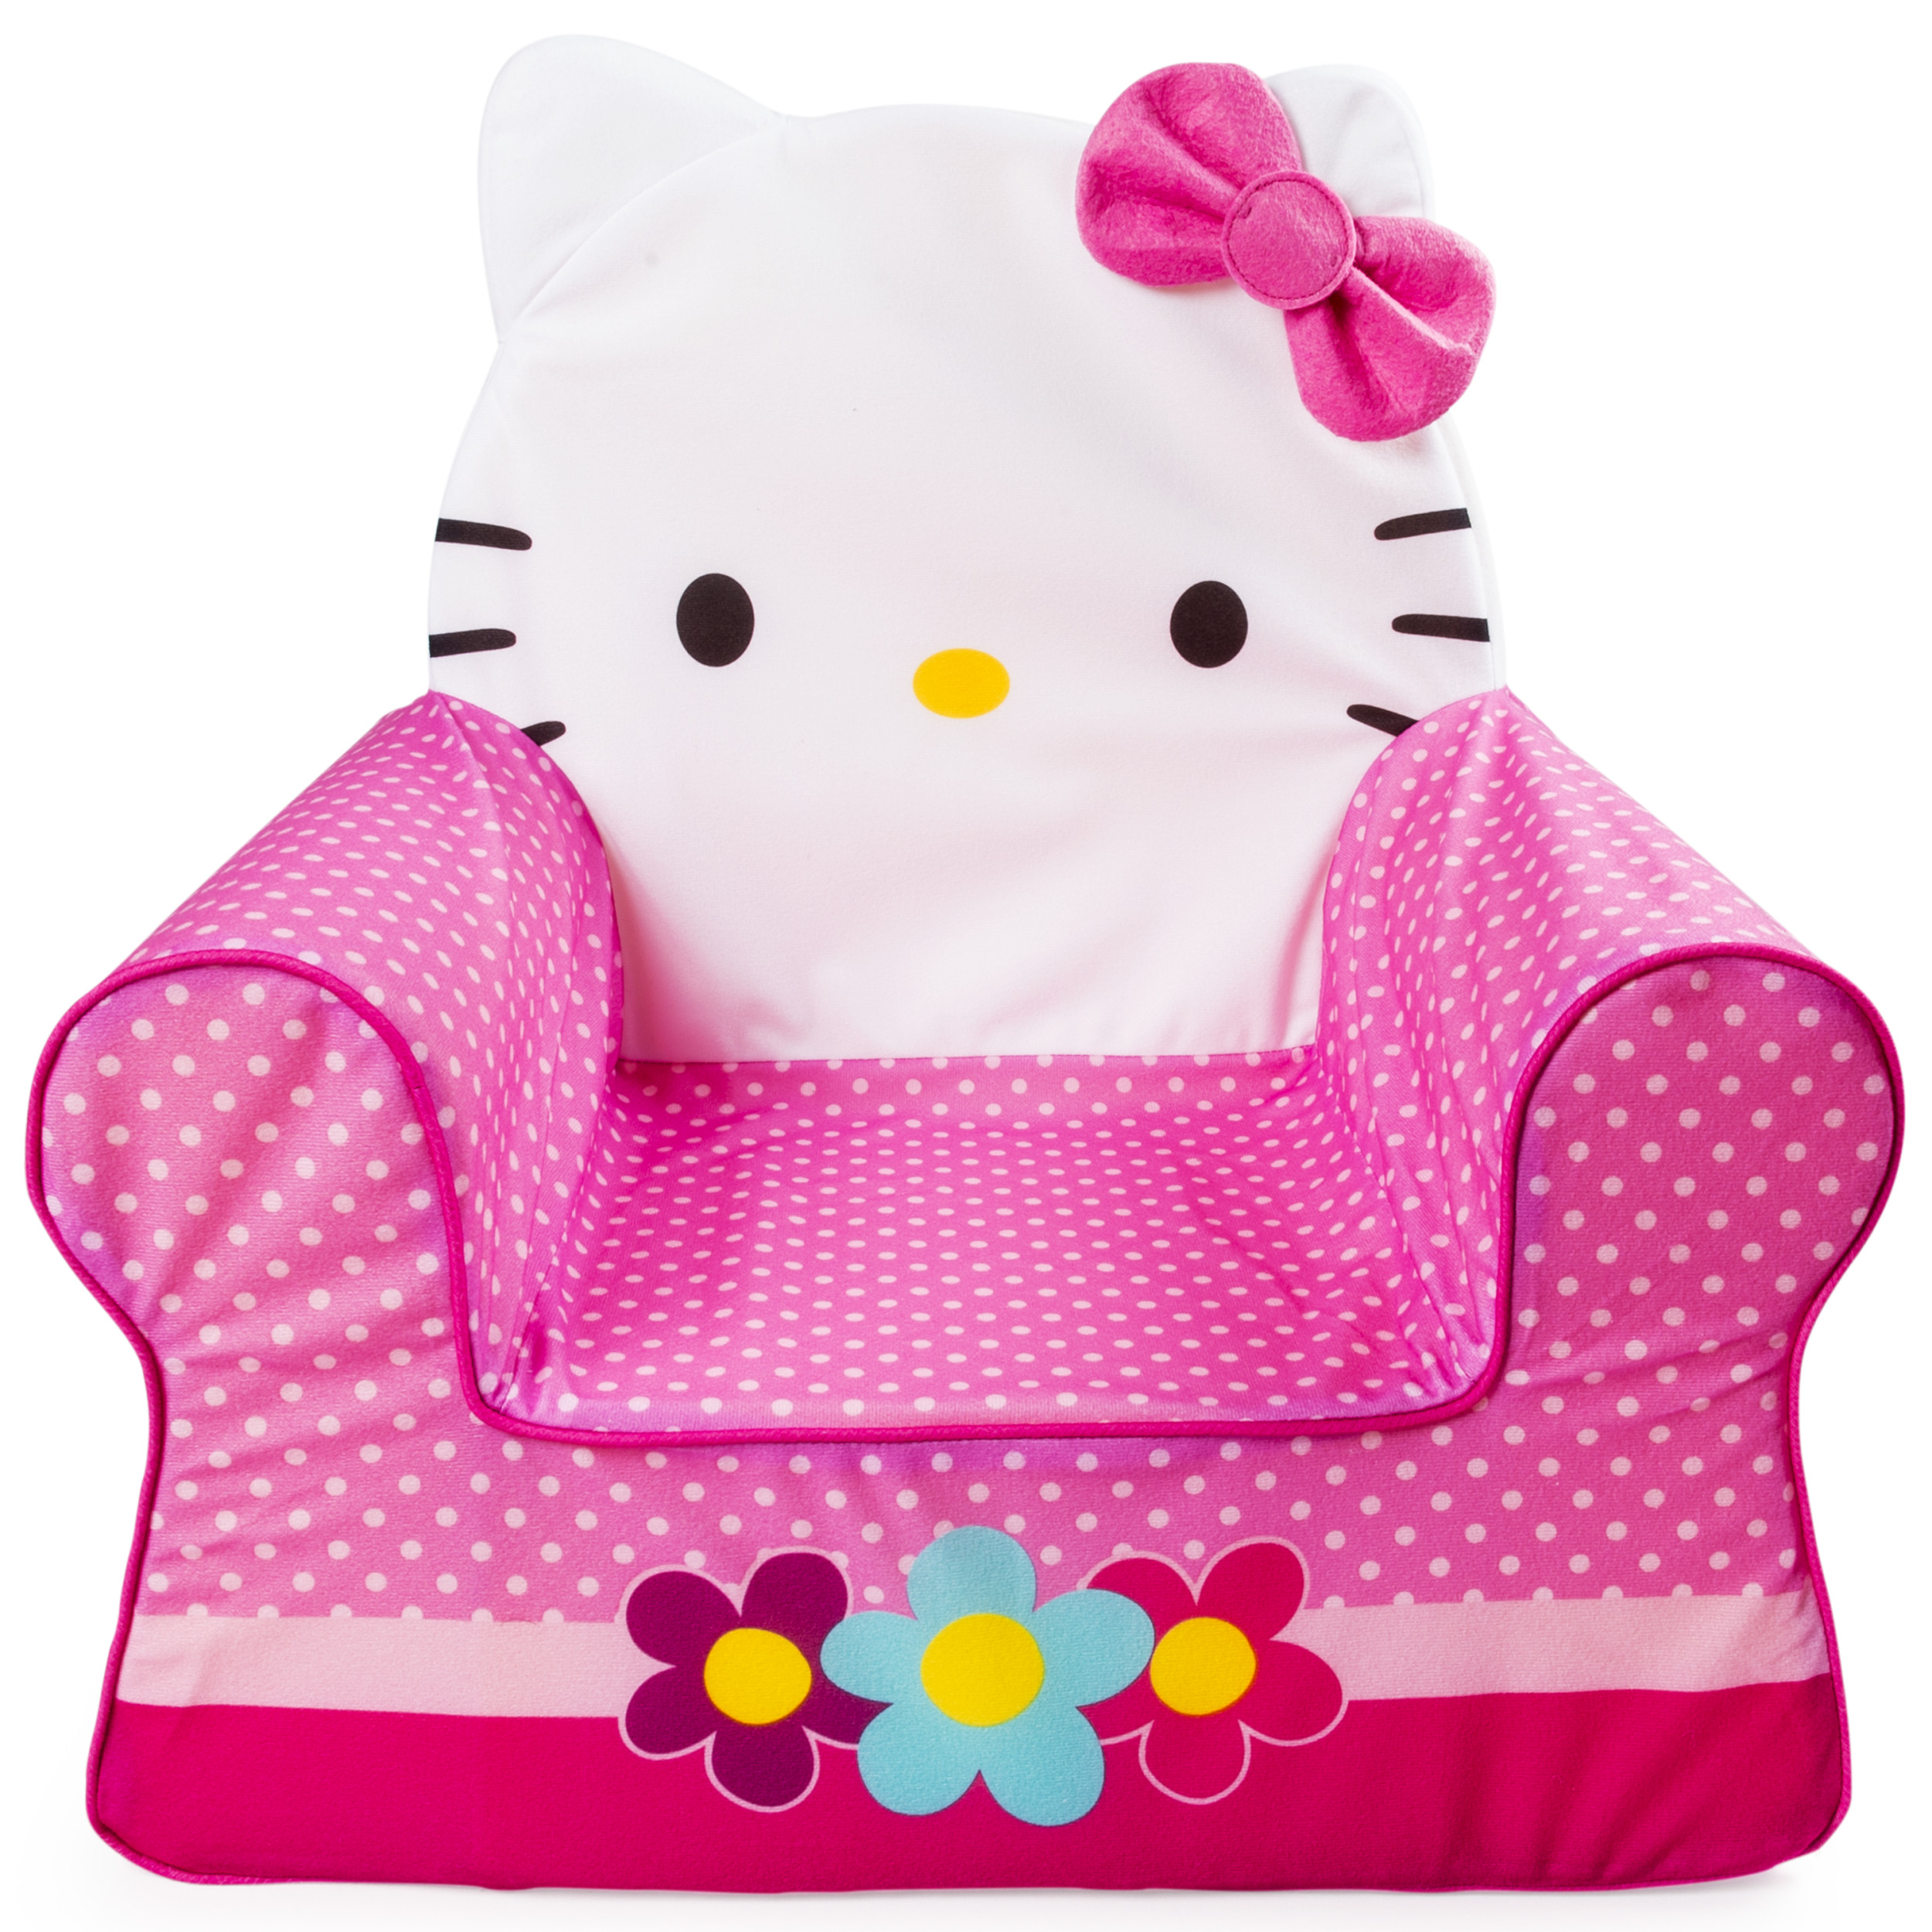 Kids Comfy Chair  Marshmallow Furniture Children s Foam fy Chair Hello